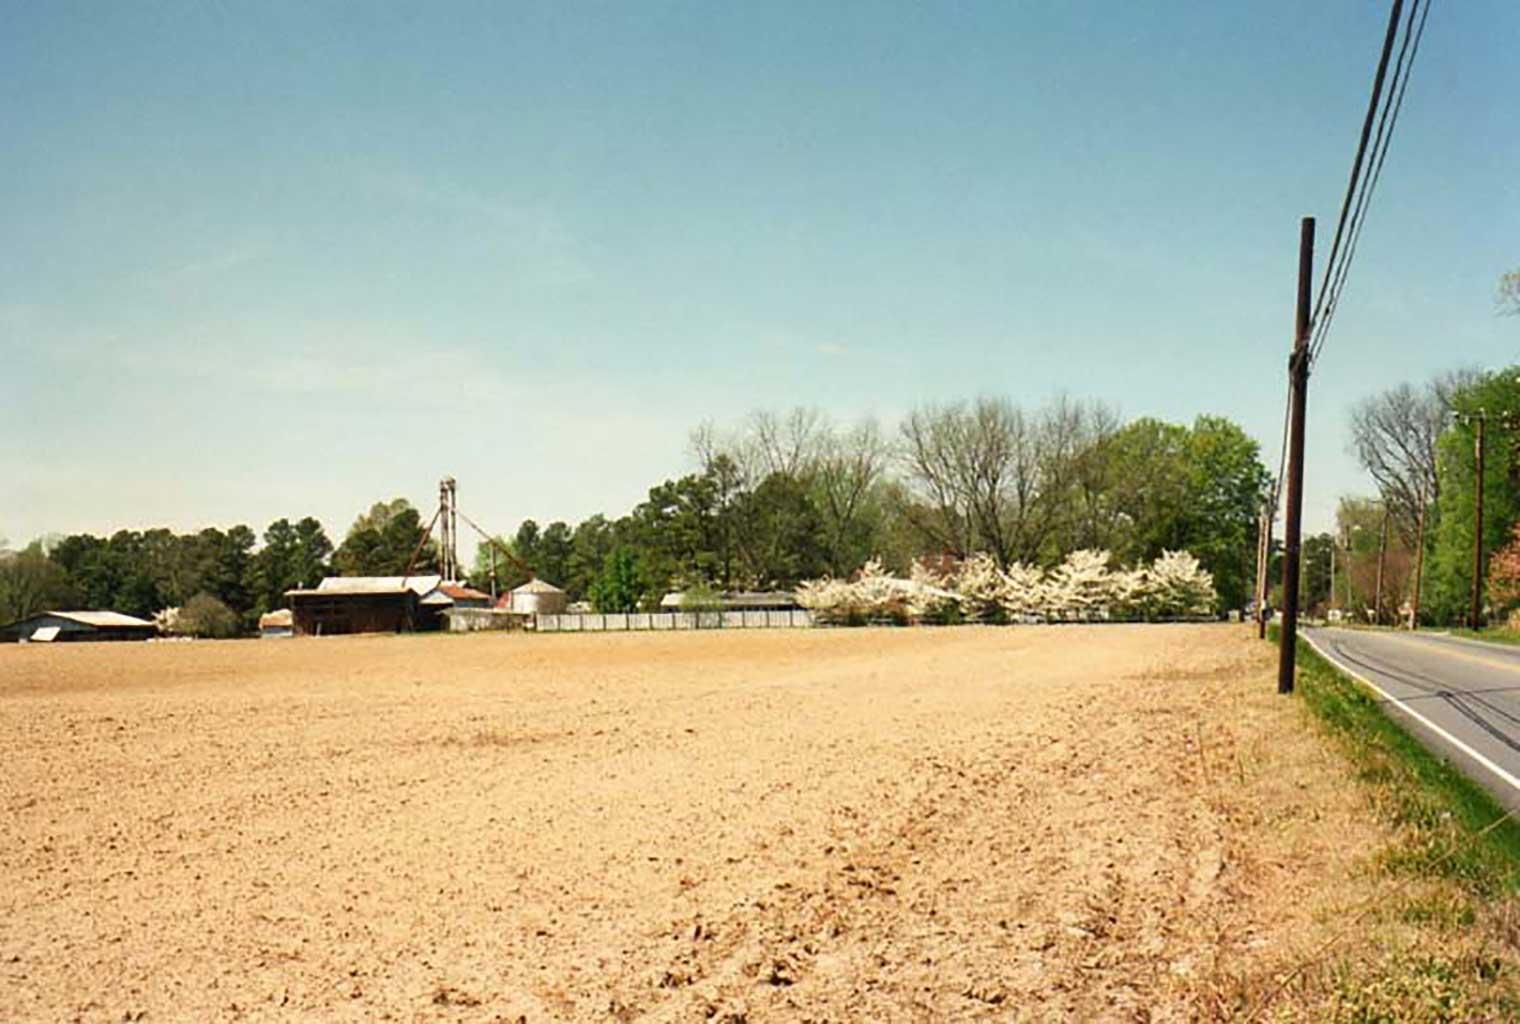 al-glasscock-field-and-barn-img295